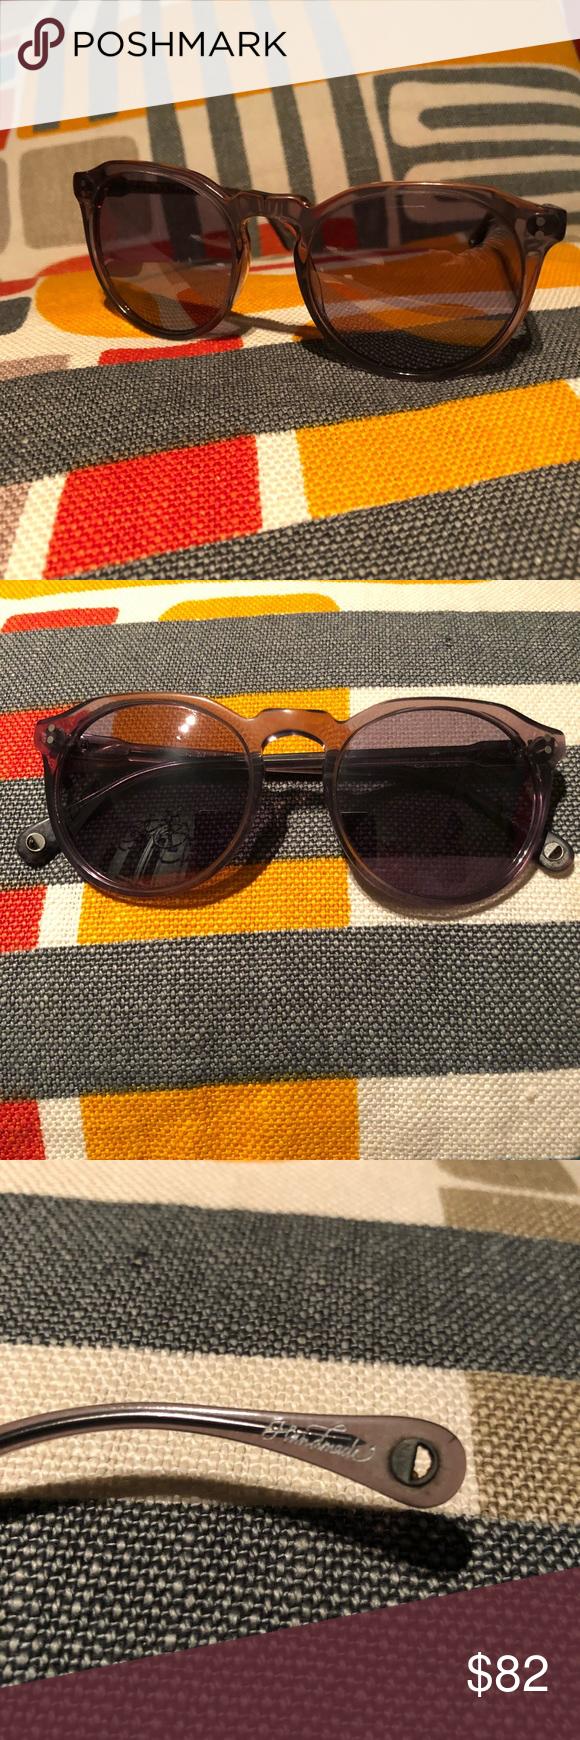 "e03d2057aa8 Raen Remmy Retro Round Sunglasses Unisex ""Remmy"" Retro Round sunglasses w  modern flare."